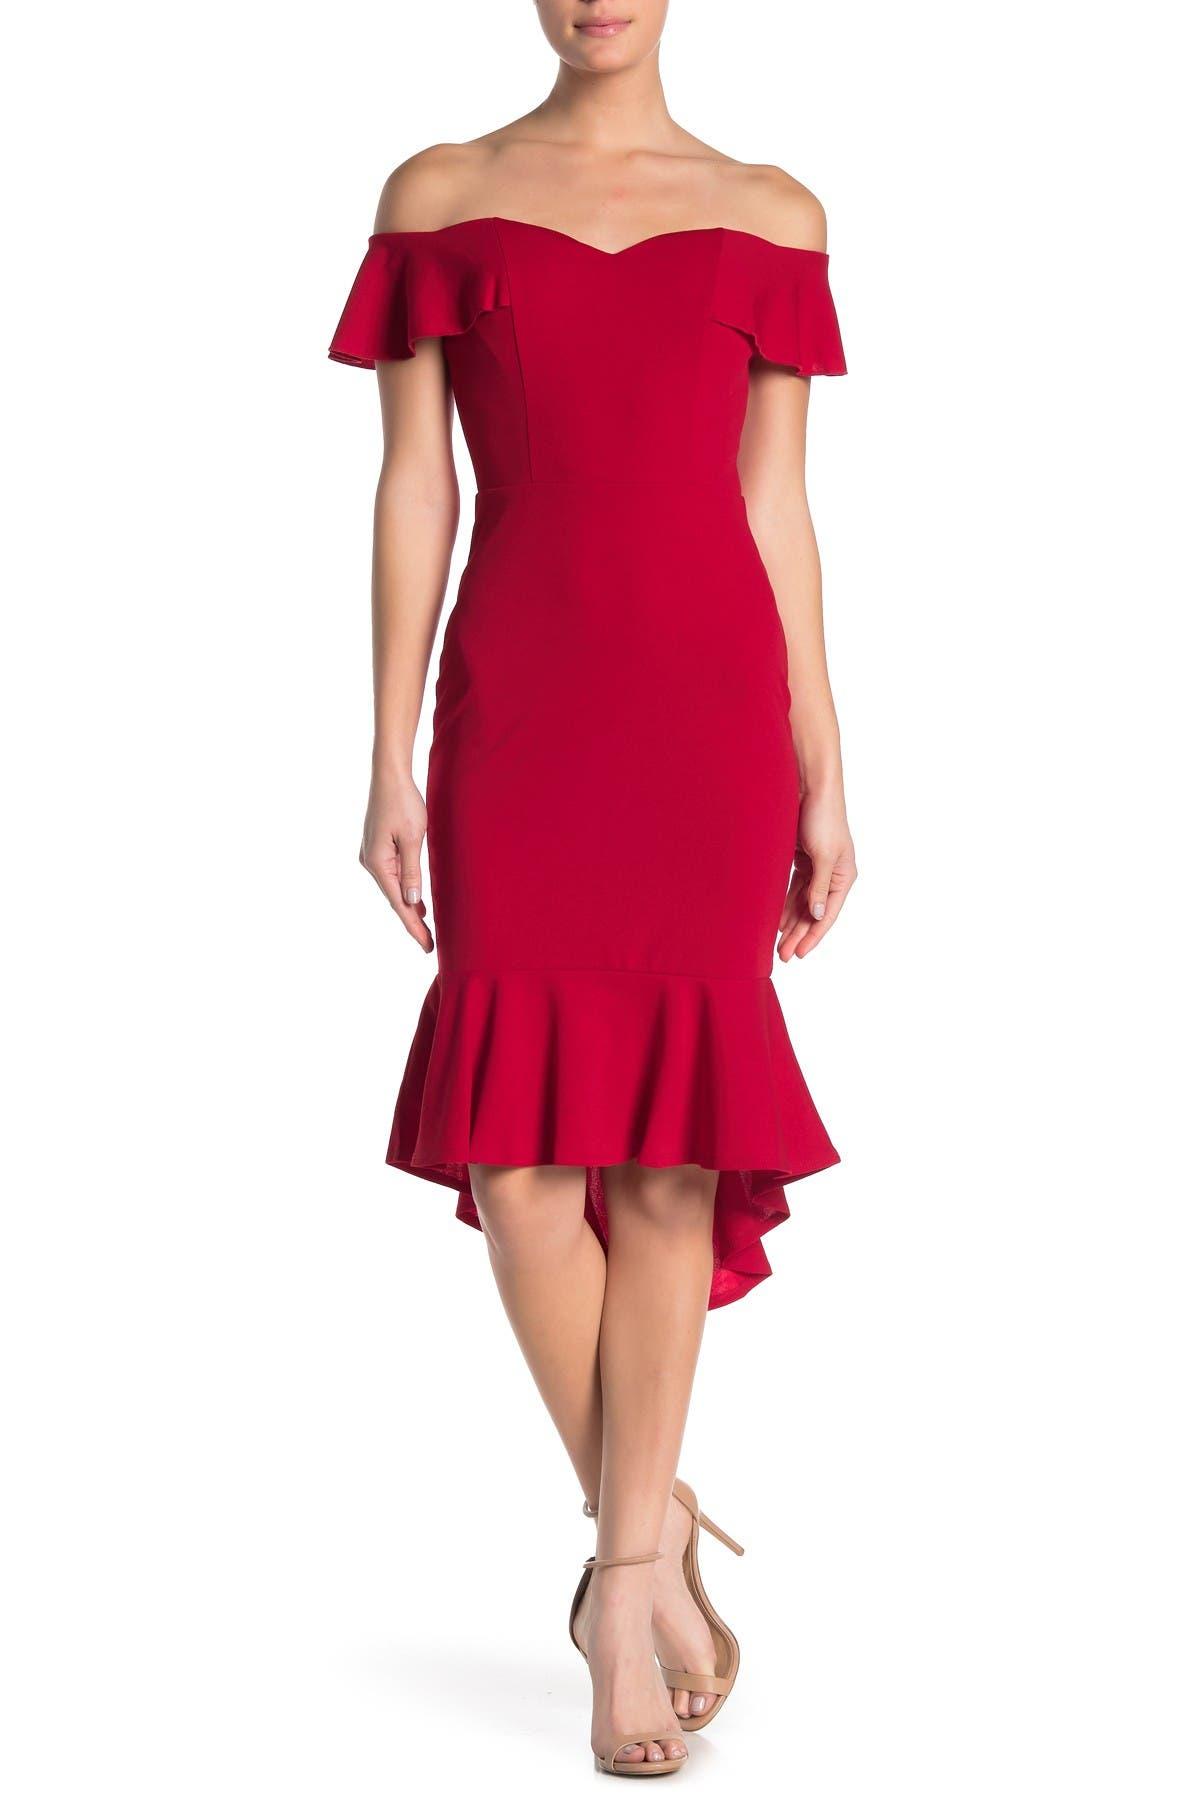 Image of BAILEY BLUE Off-the-Shoulder Dress